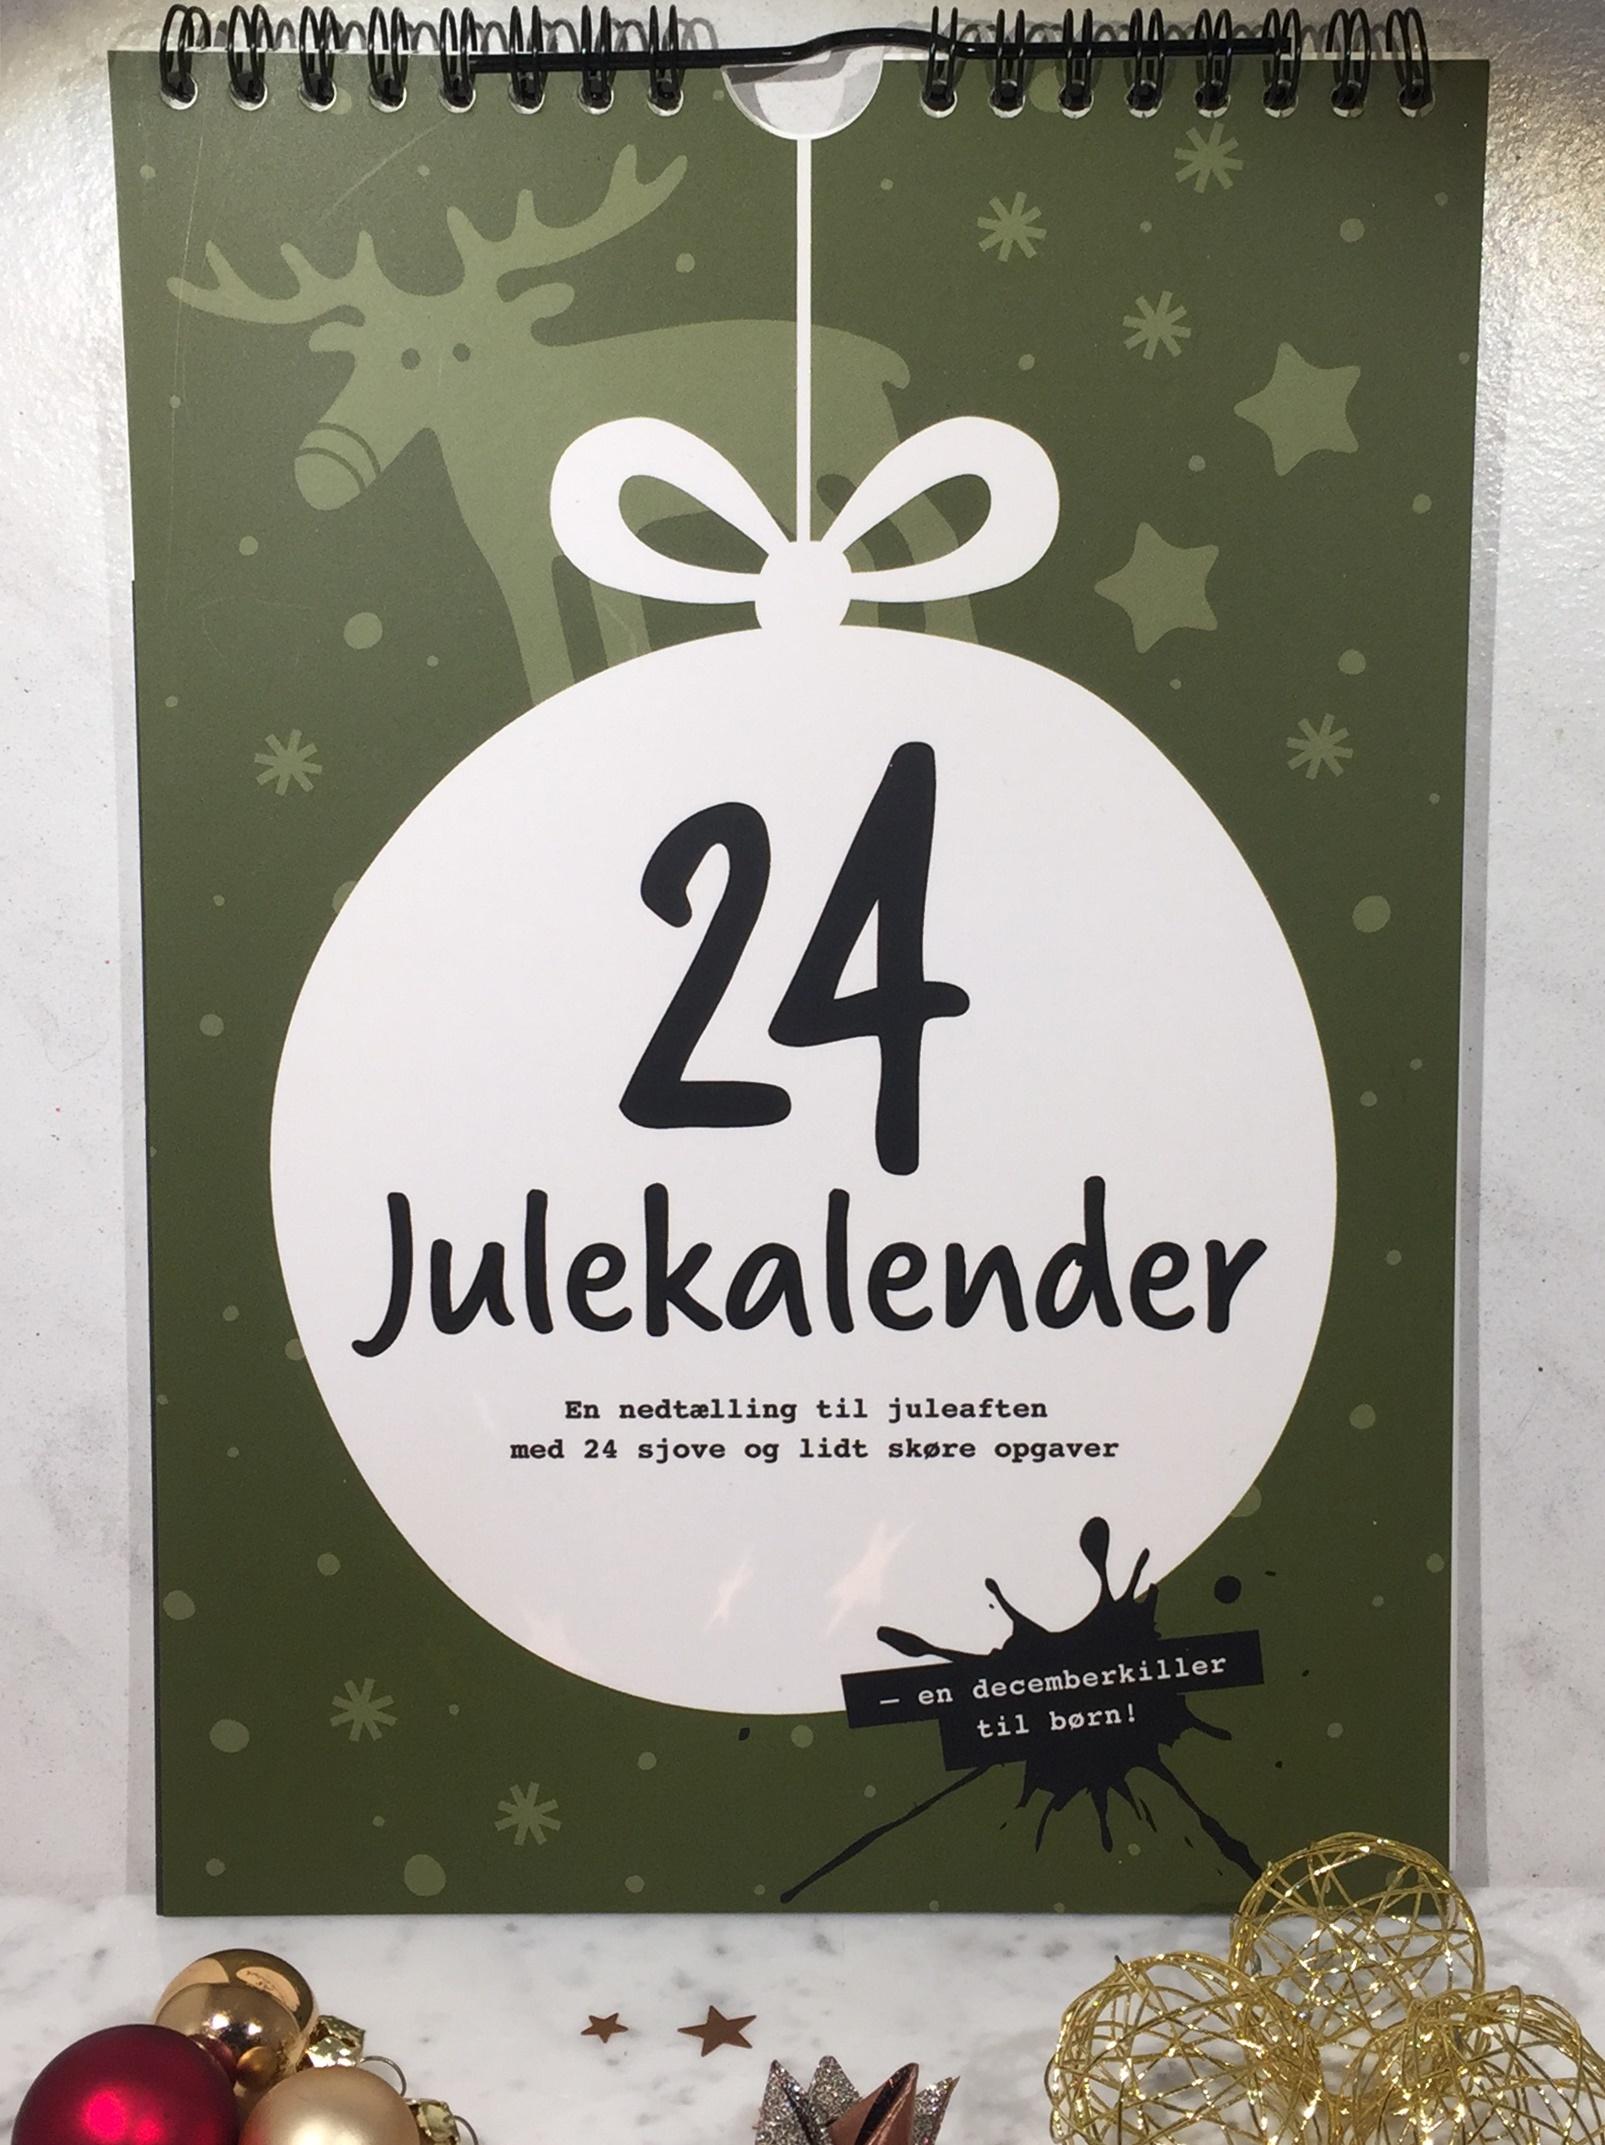 Julekalender, Julekalender 2017, 24Julekalender, 24 Julekalender, Julekalender Grøn, Julekalender Børn